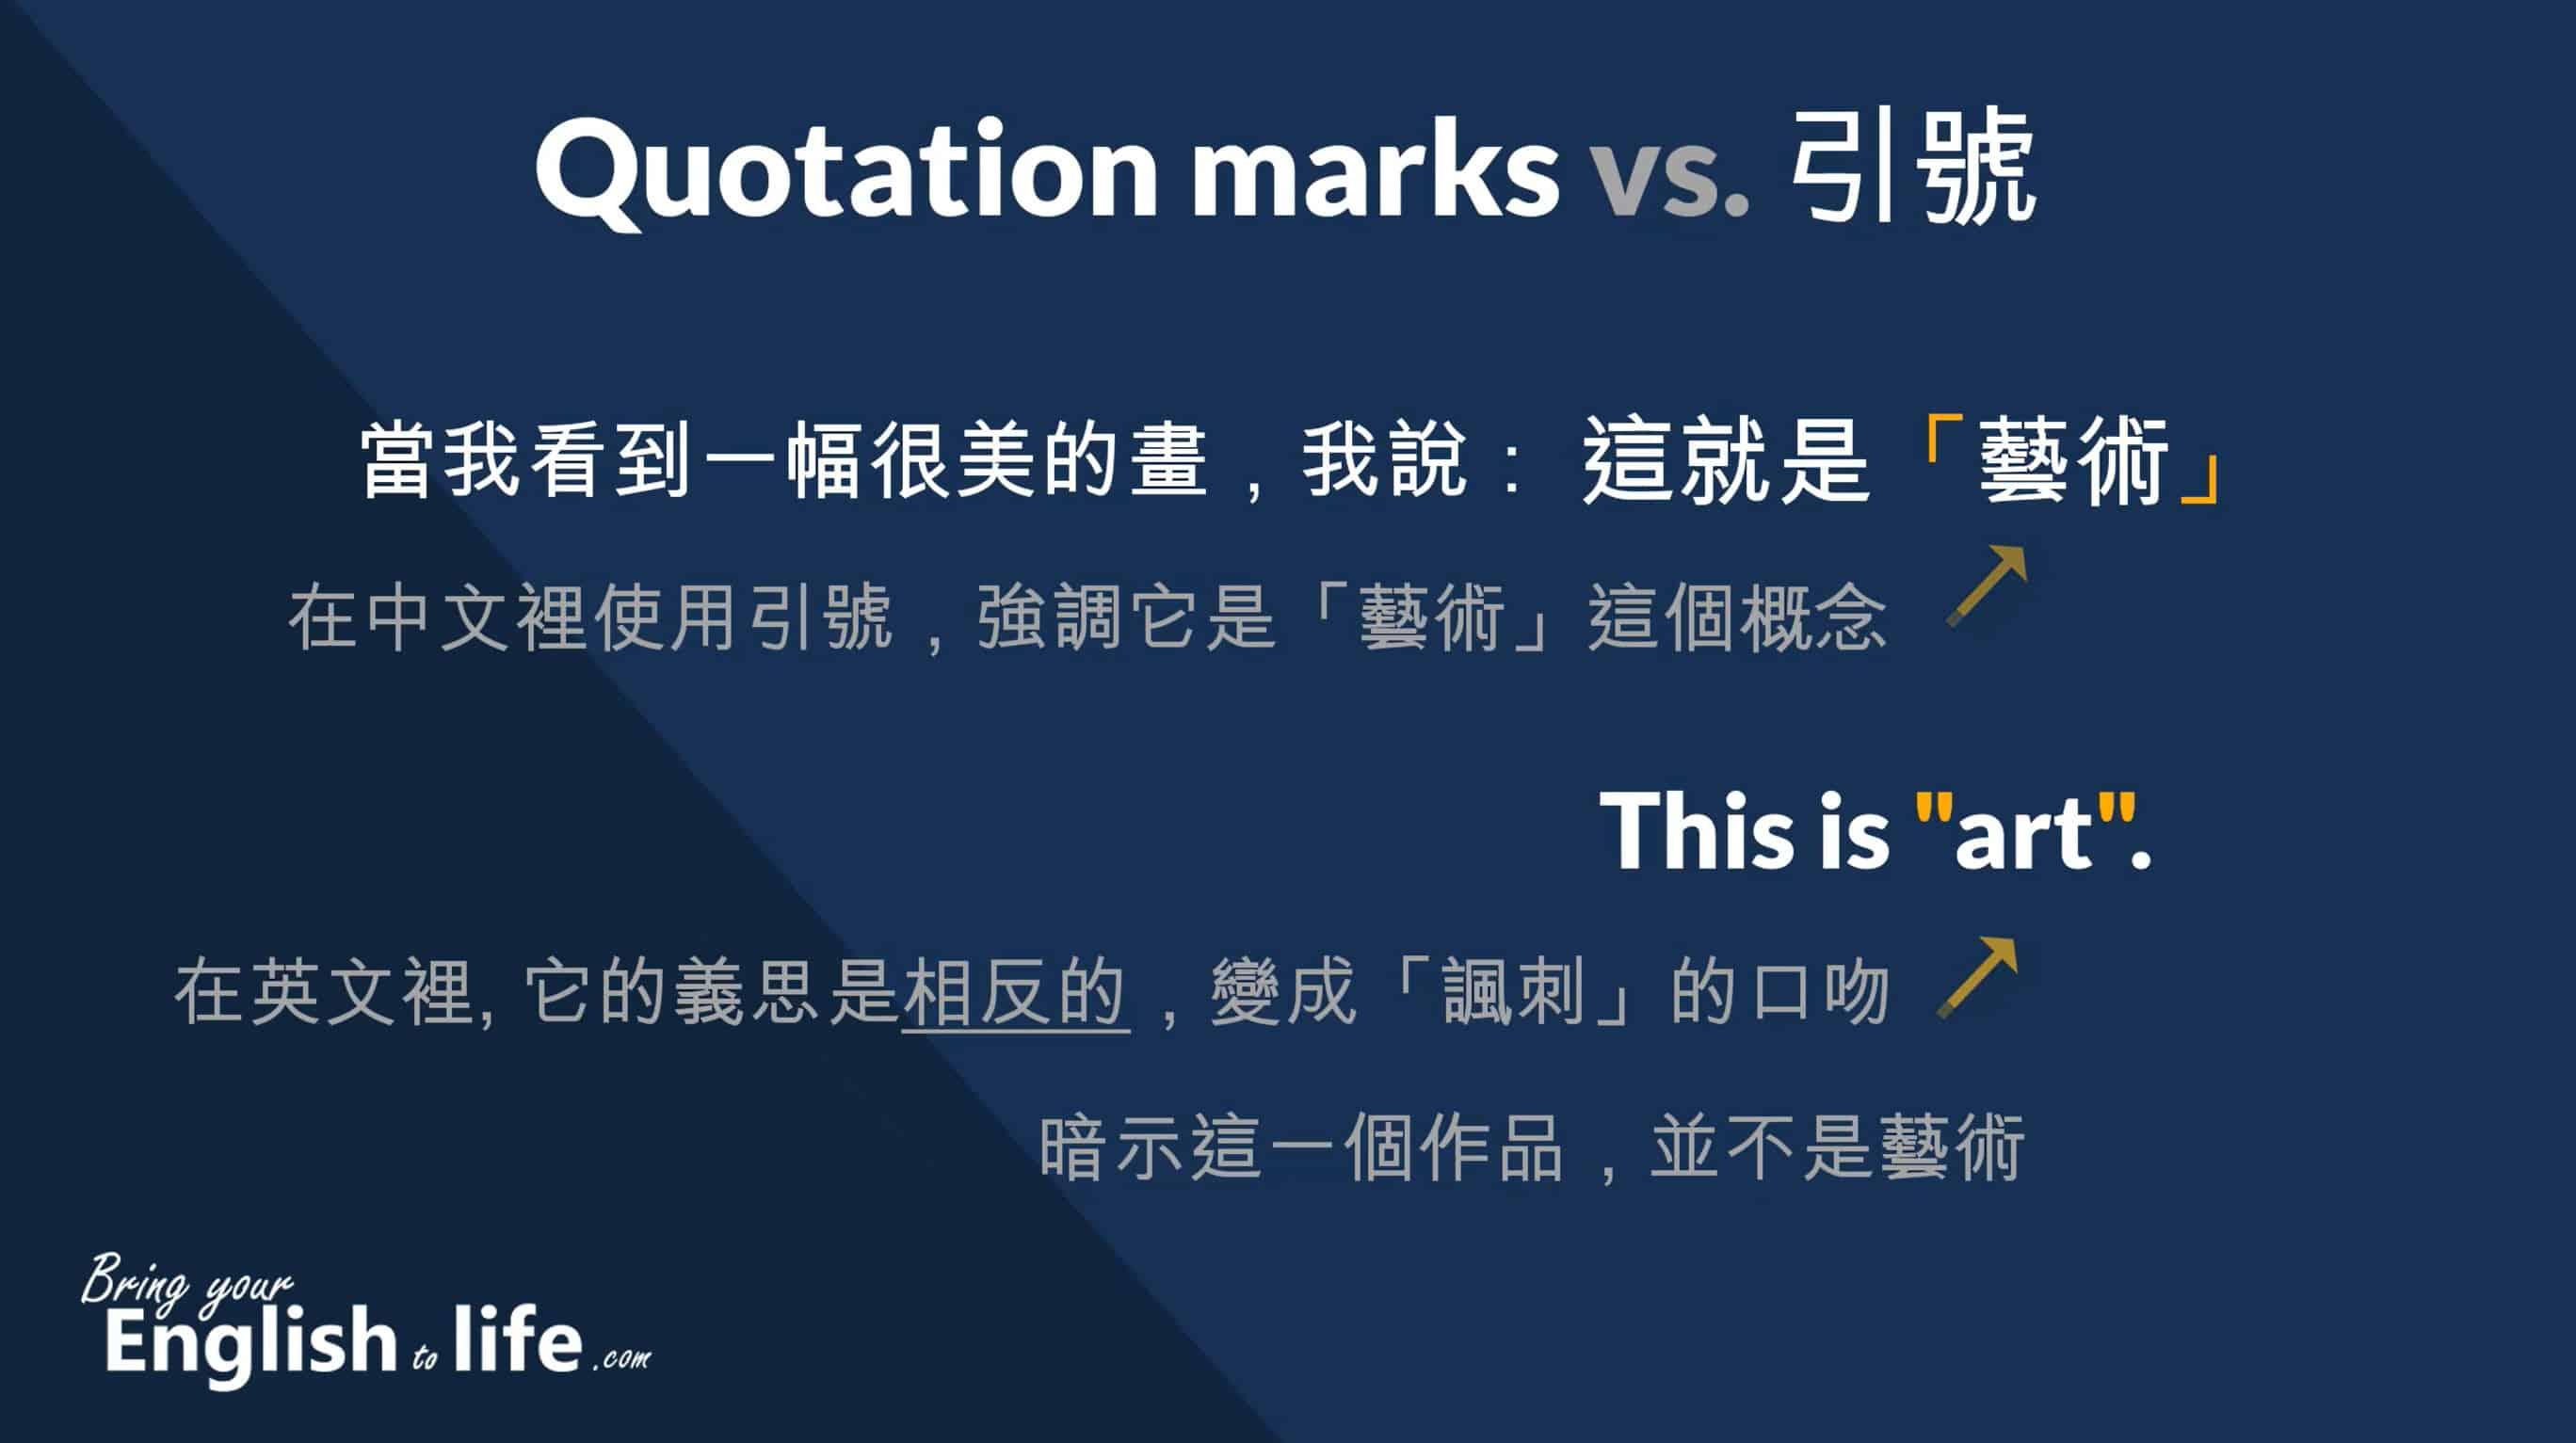 Quotation marks 與引號的大差別 | 中文 vs. 英文標點符號 (Punctuation) - 活化英文 Bring Your English to Life